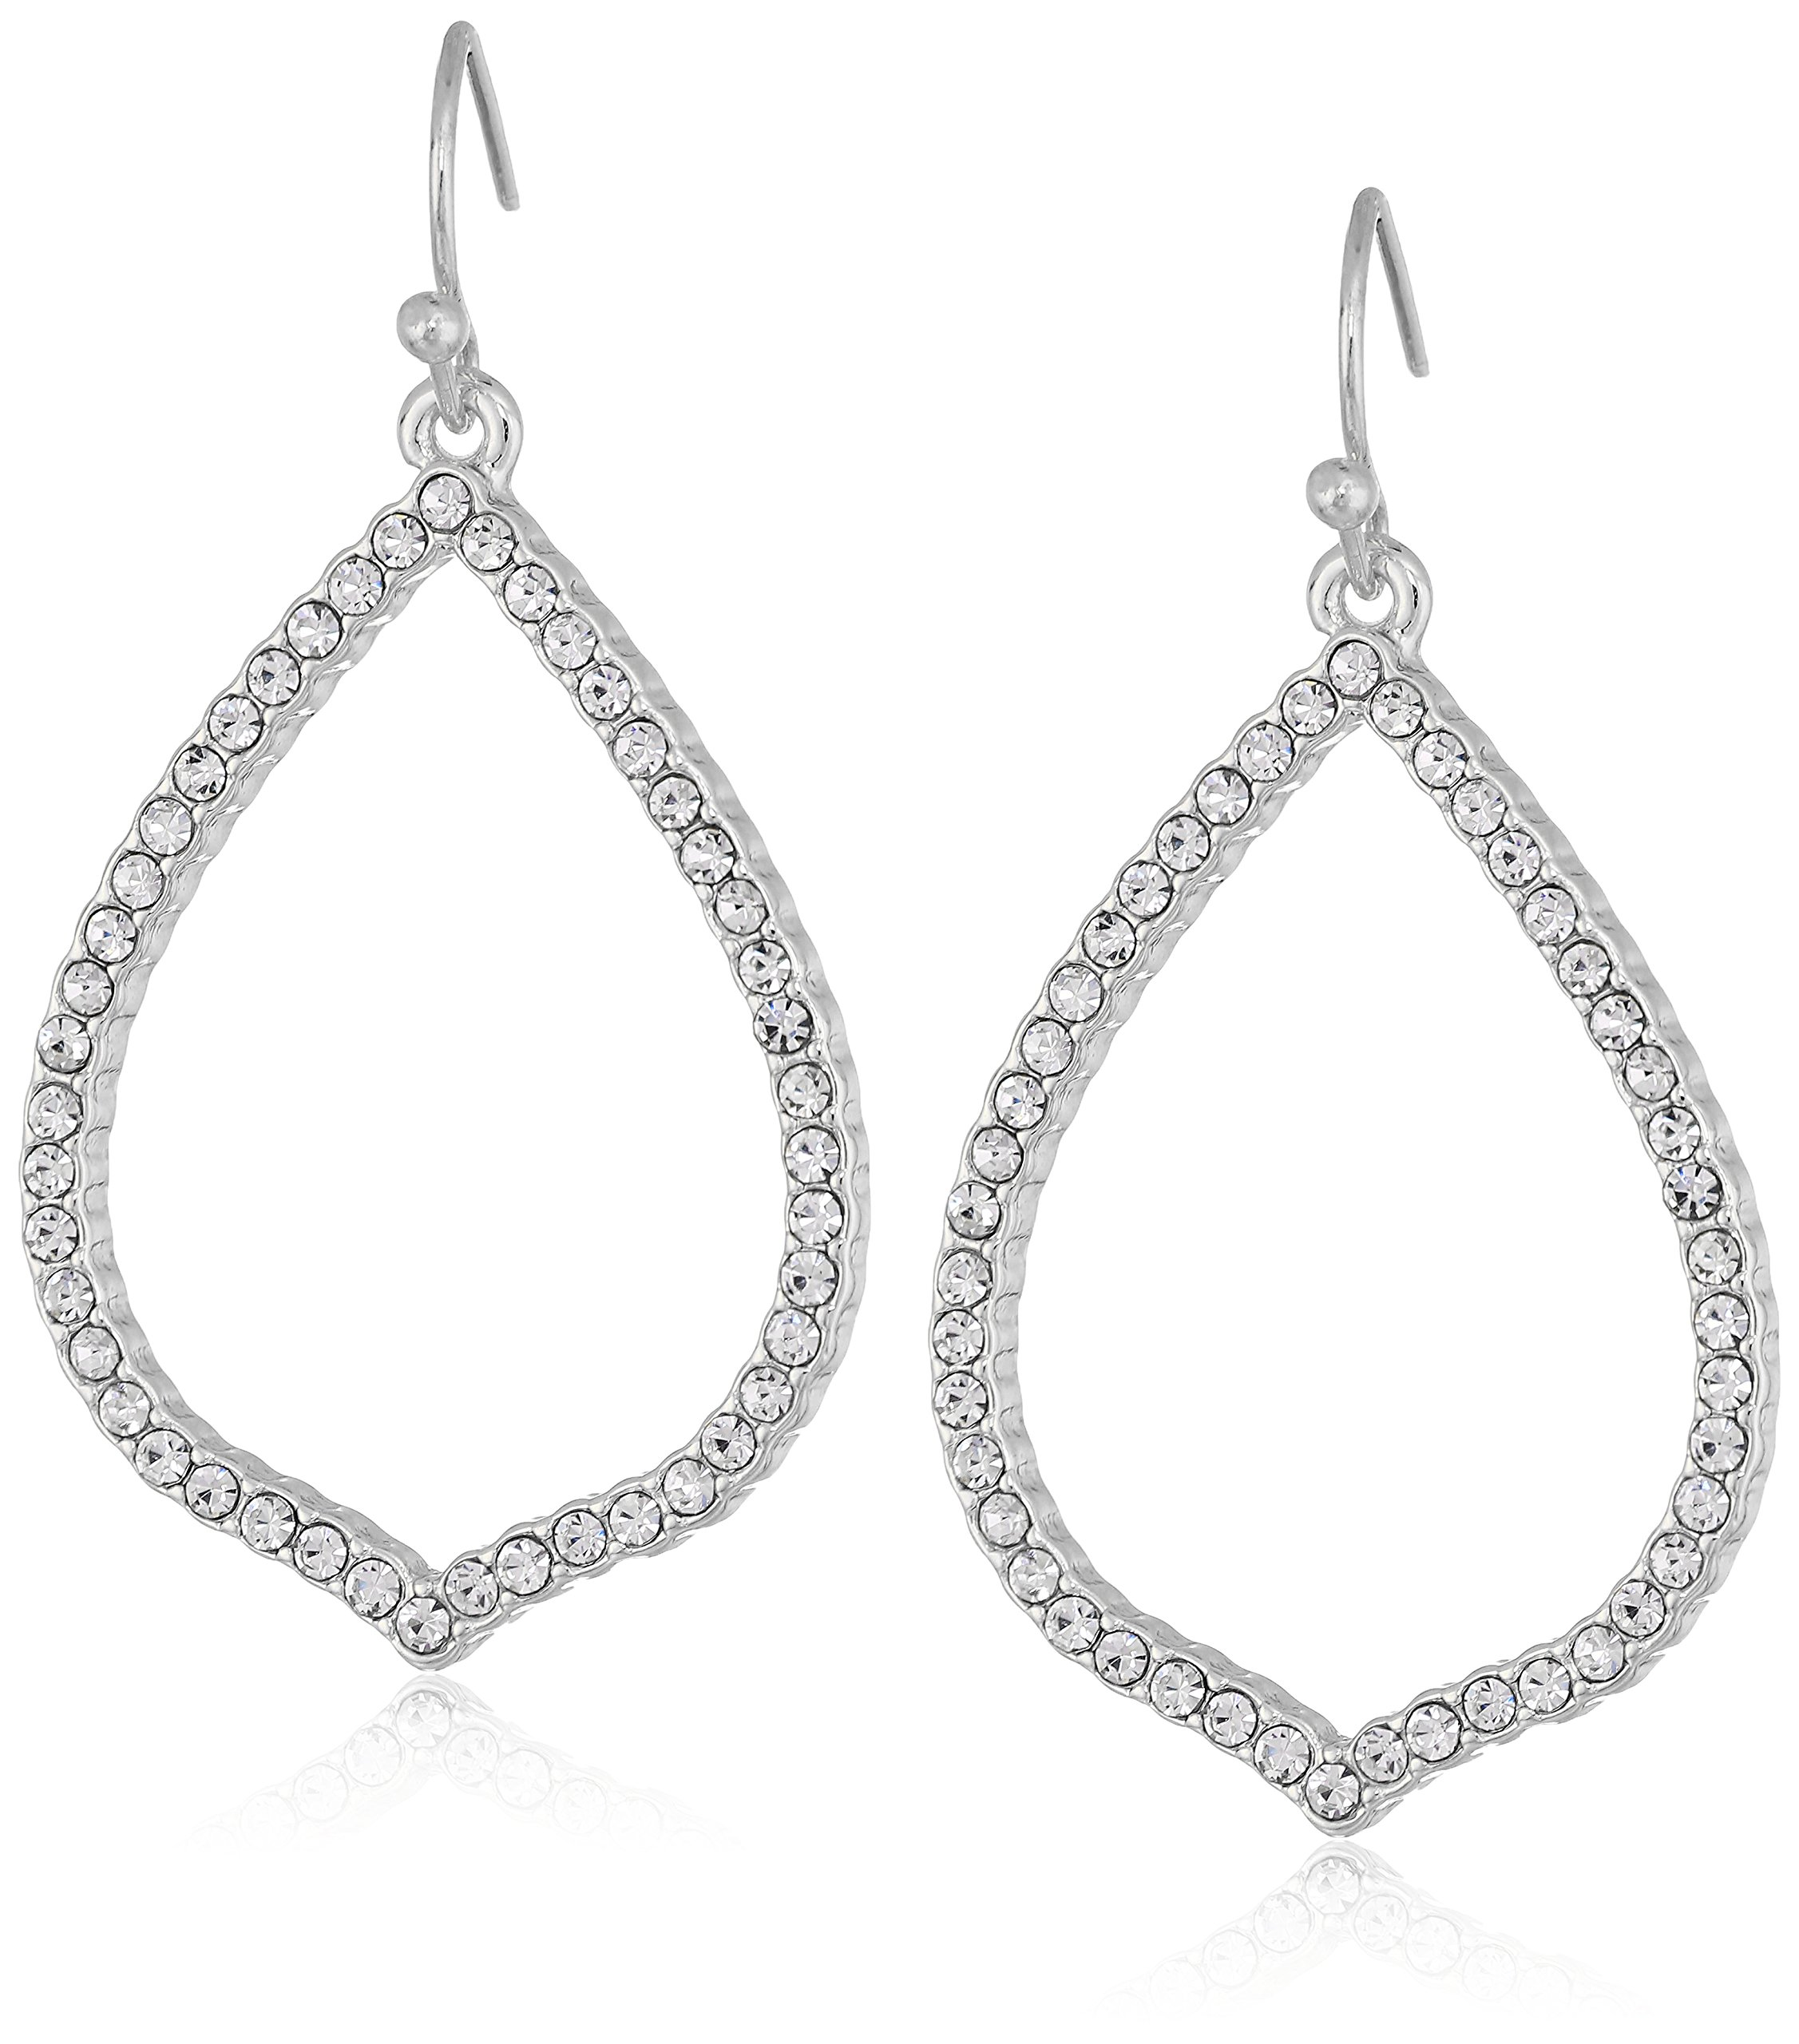 T Tahari Essentials Women's Pave Teardrop Hoop On Fish Wire Drop Earrings, Silver, One Size